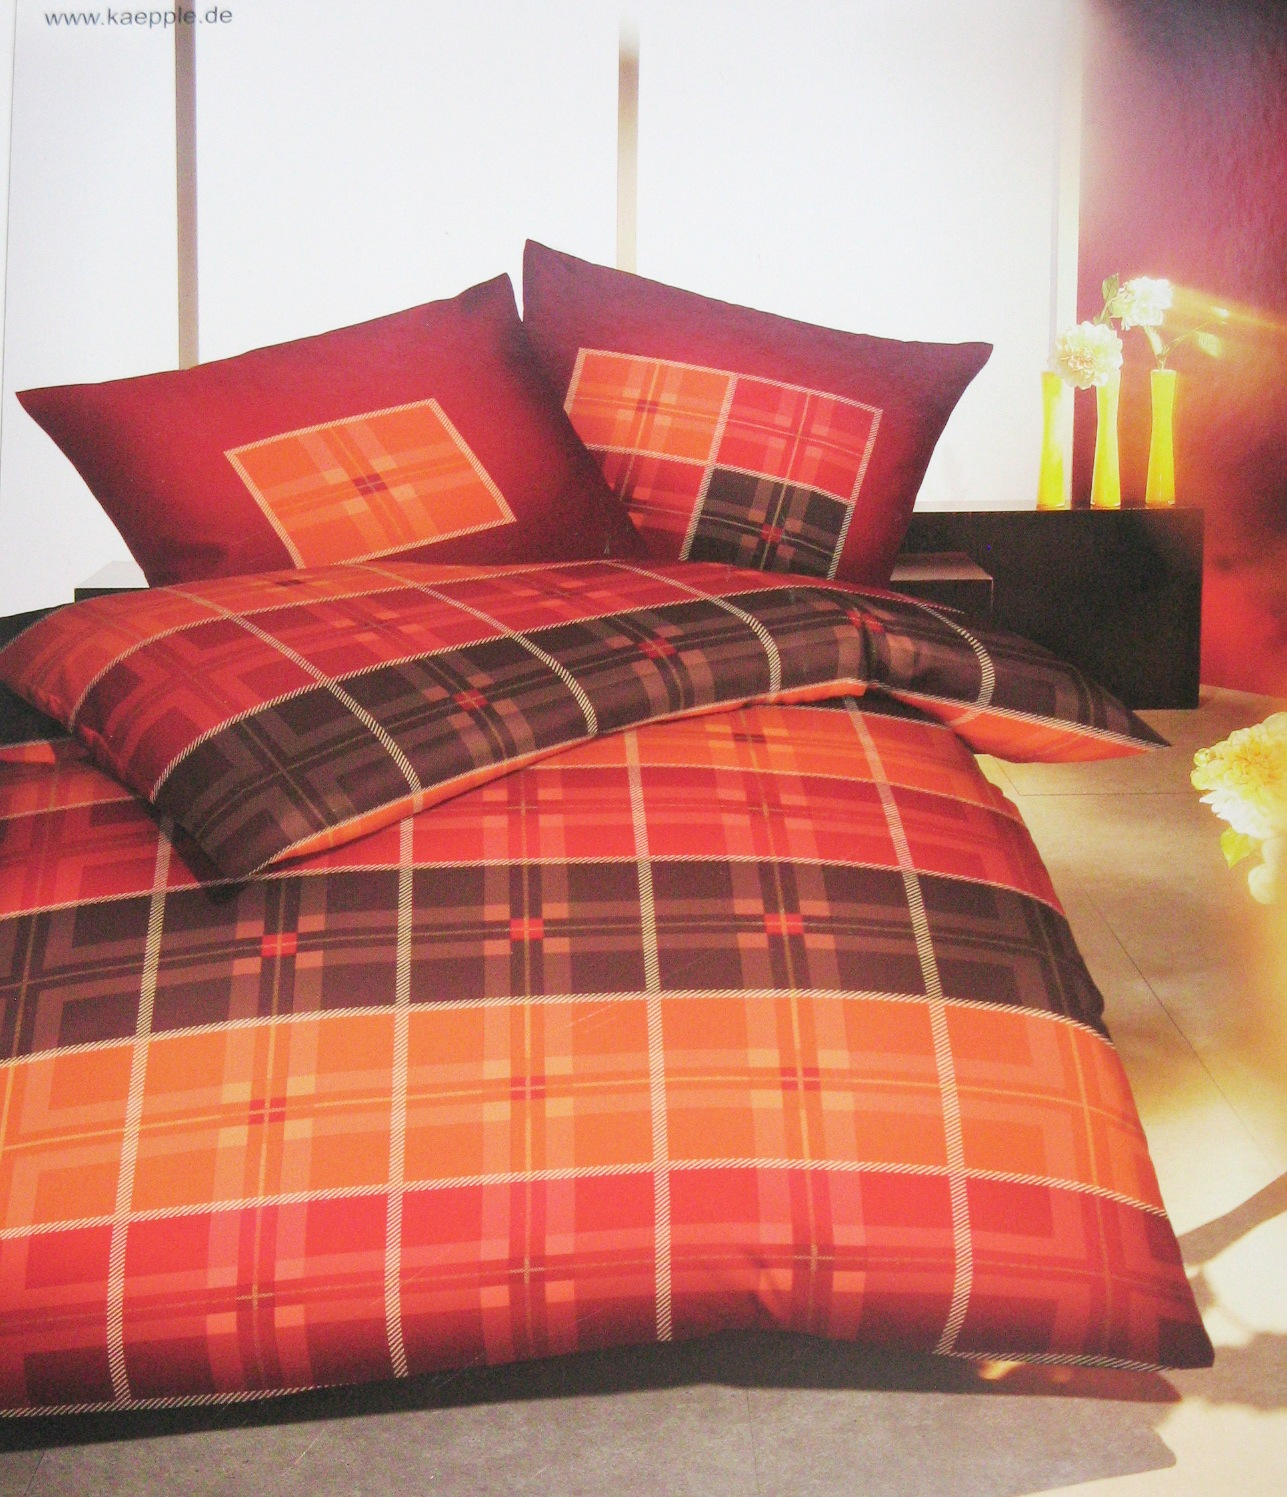 kaeppel microfaser flanell bettw sche karo look terra. Black Bedroom Furniture Sets. Home Design Ideas